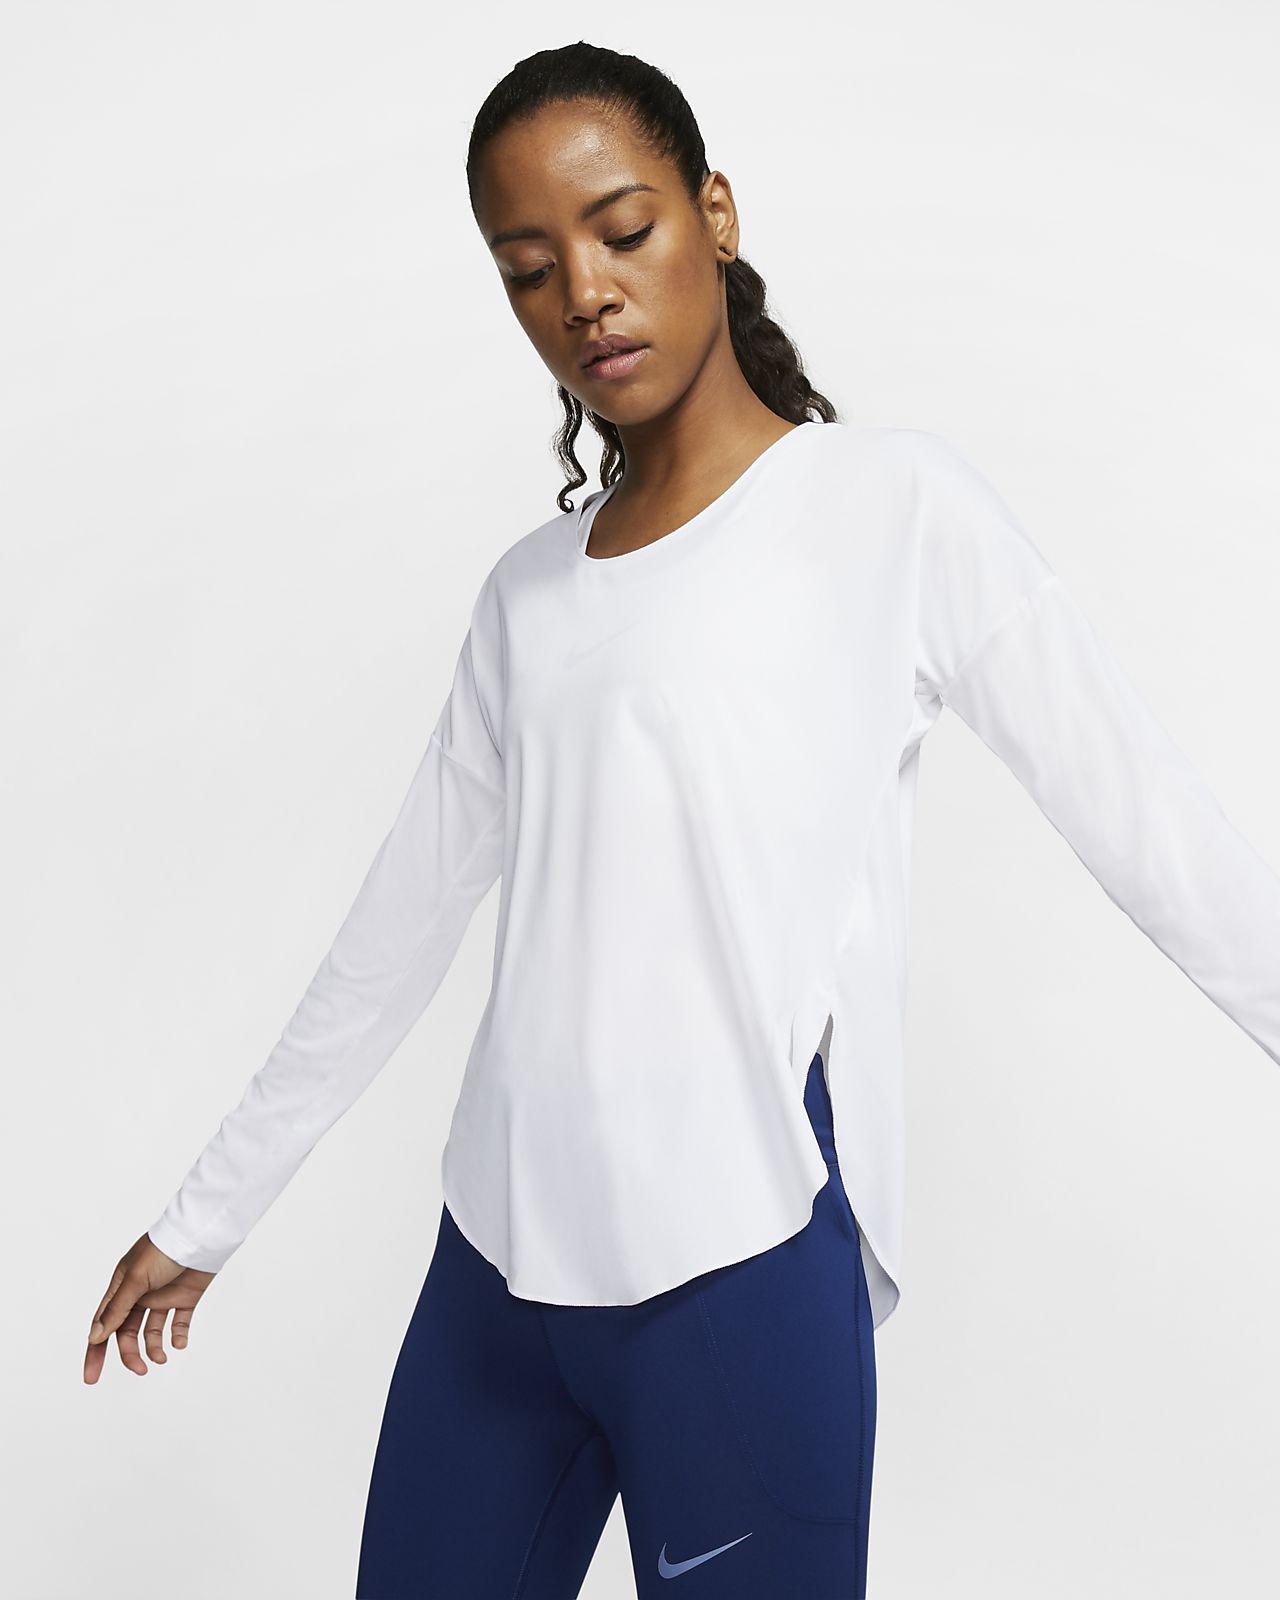 Nike City Sleek Women's Long-Sleeve Running Top